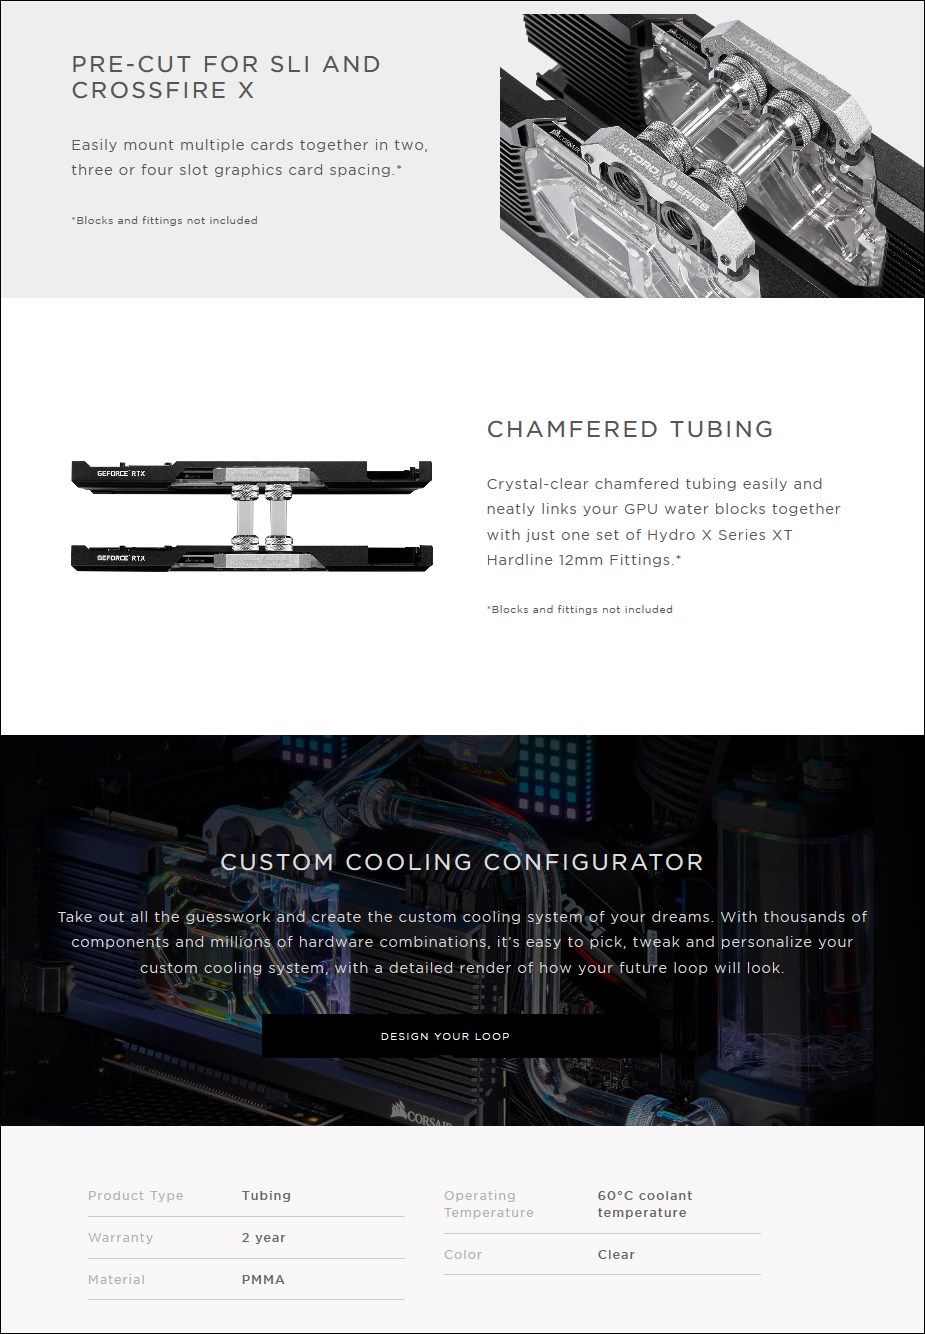 Corsair Hydro X Series XT Hardline 12mm Multicard Kit - Overview 1